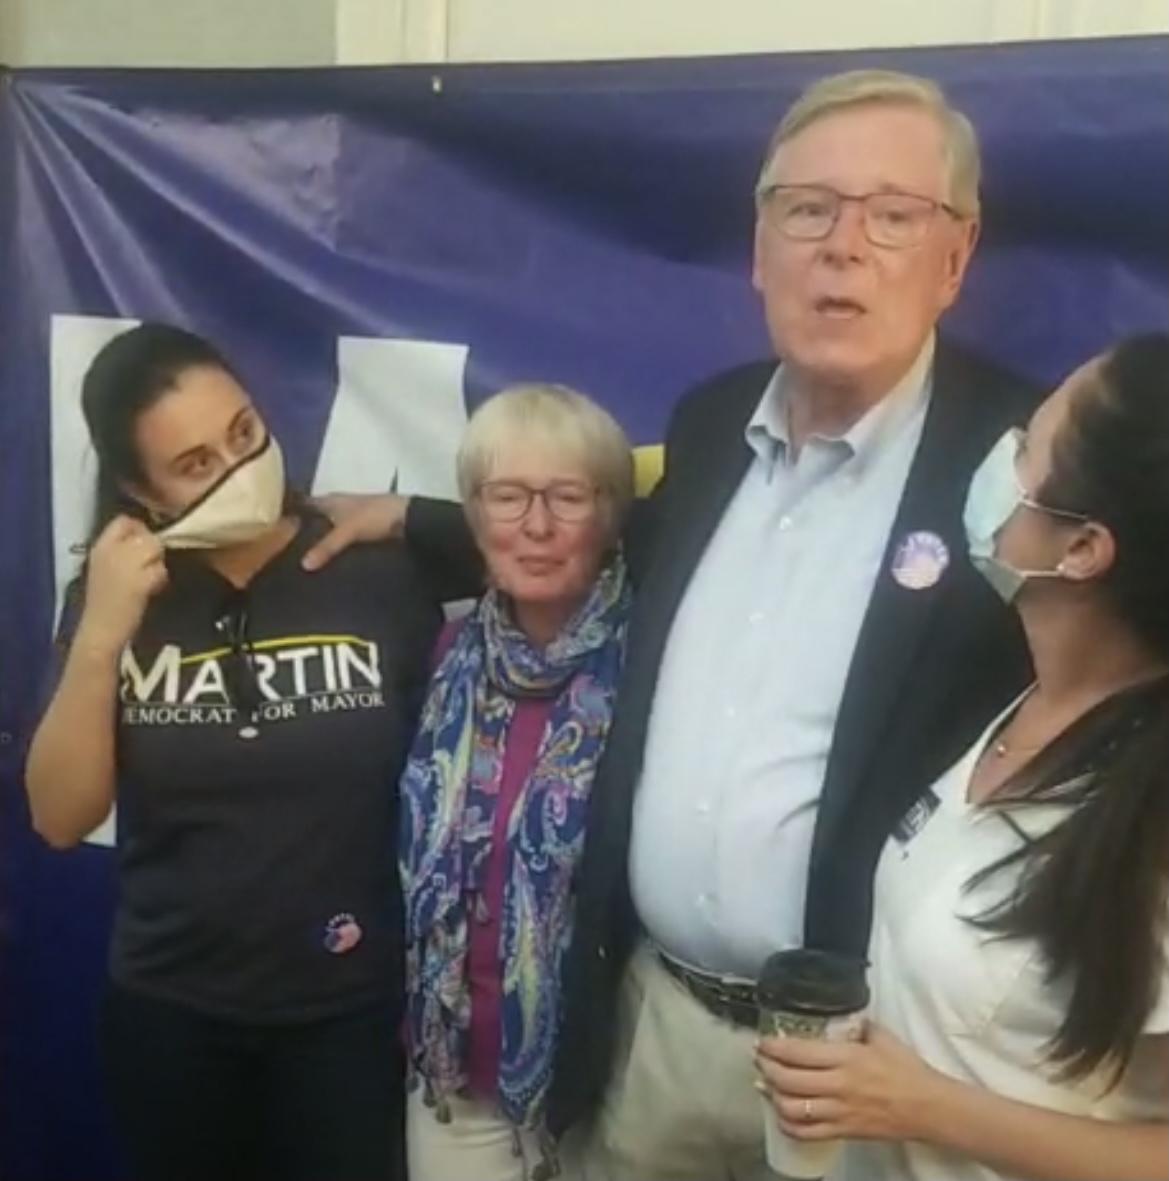 Mayors in Stamford and Hamden lose Democratic primaries